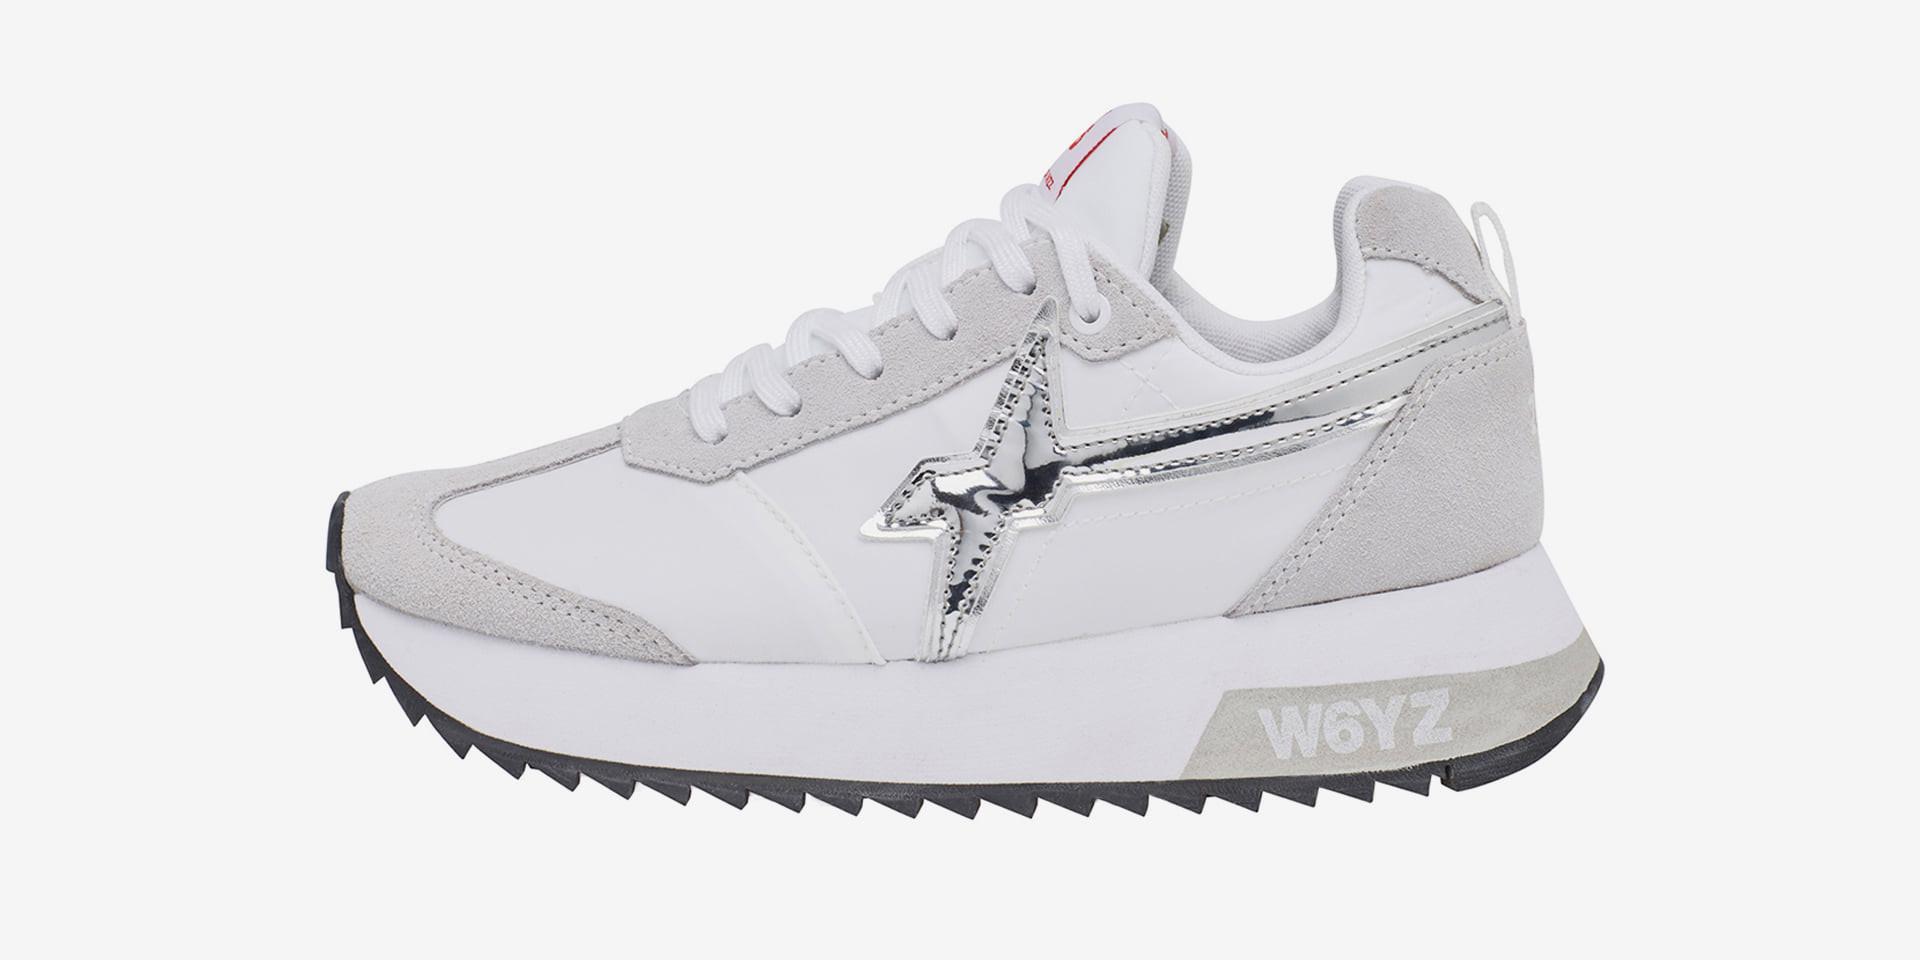 KIS-W. - Sneaker in pelle e tessuto tecnico - Bianco-Argento